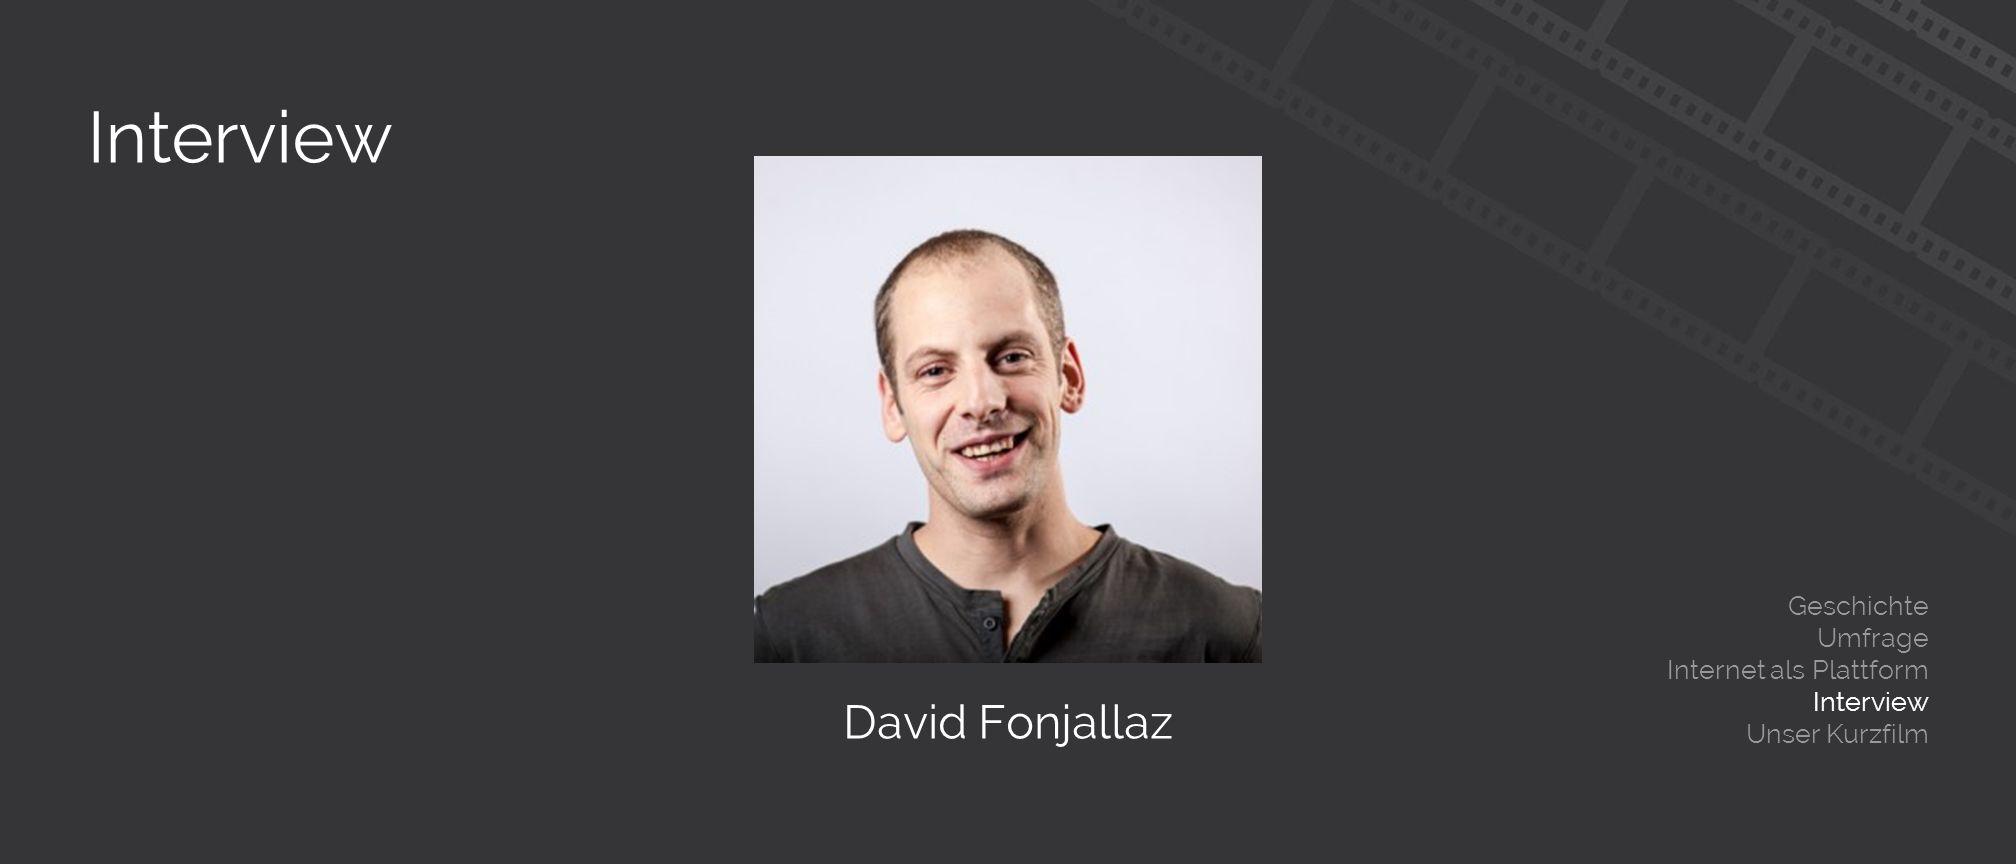 Interview Geschichte Umfrage Internet als Plattform Interview Unser Kurzfilm David Fonjallaz